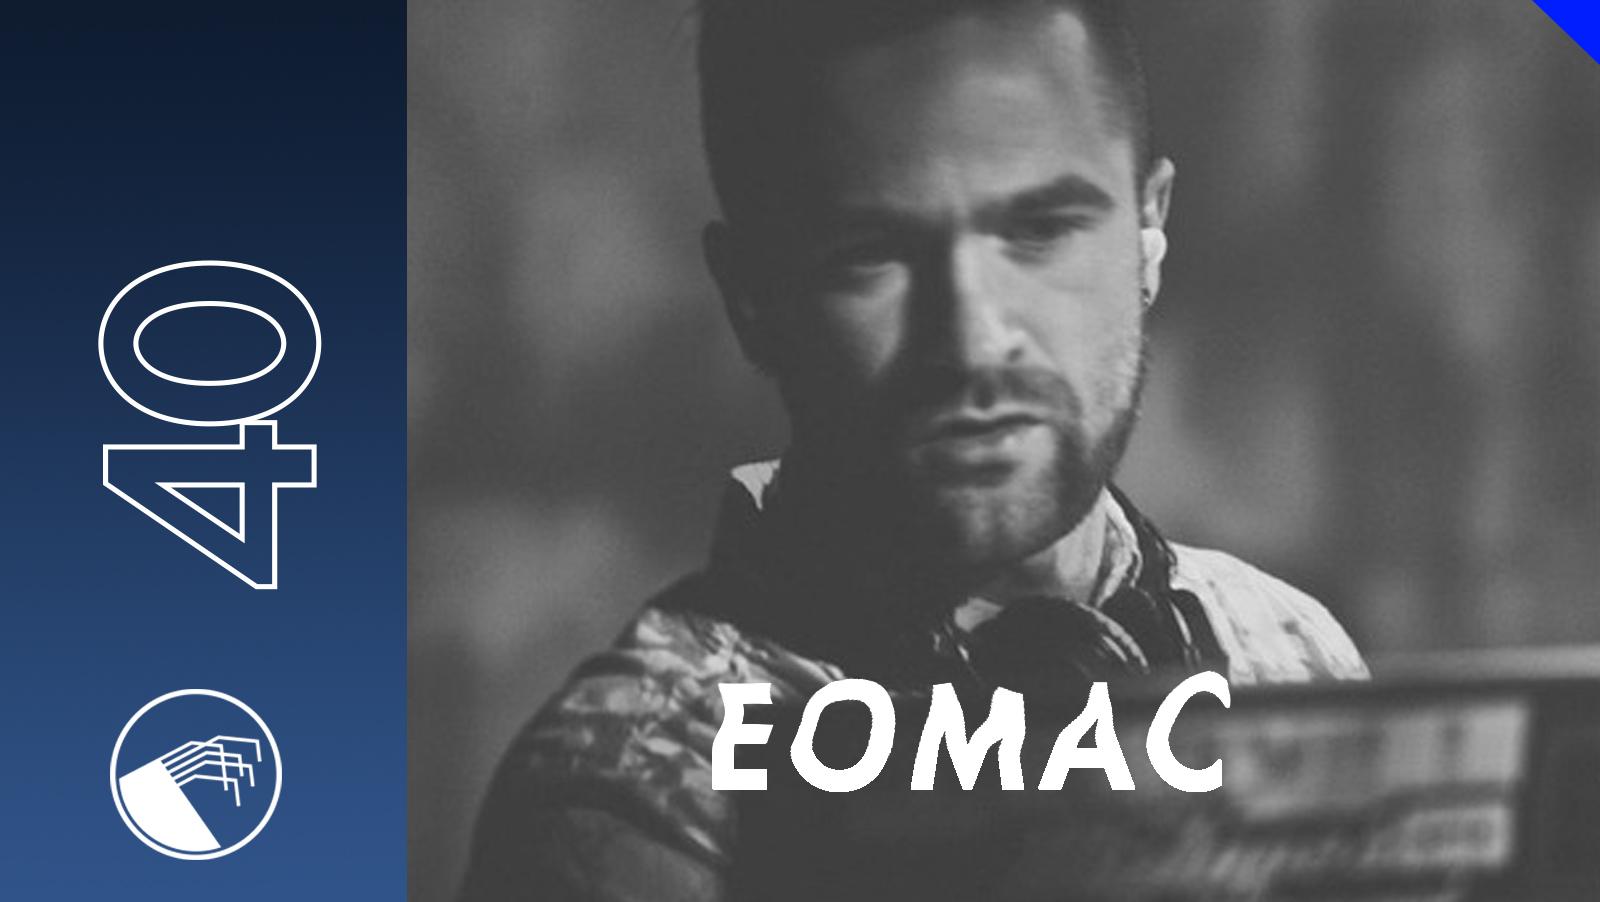 040 Eomac